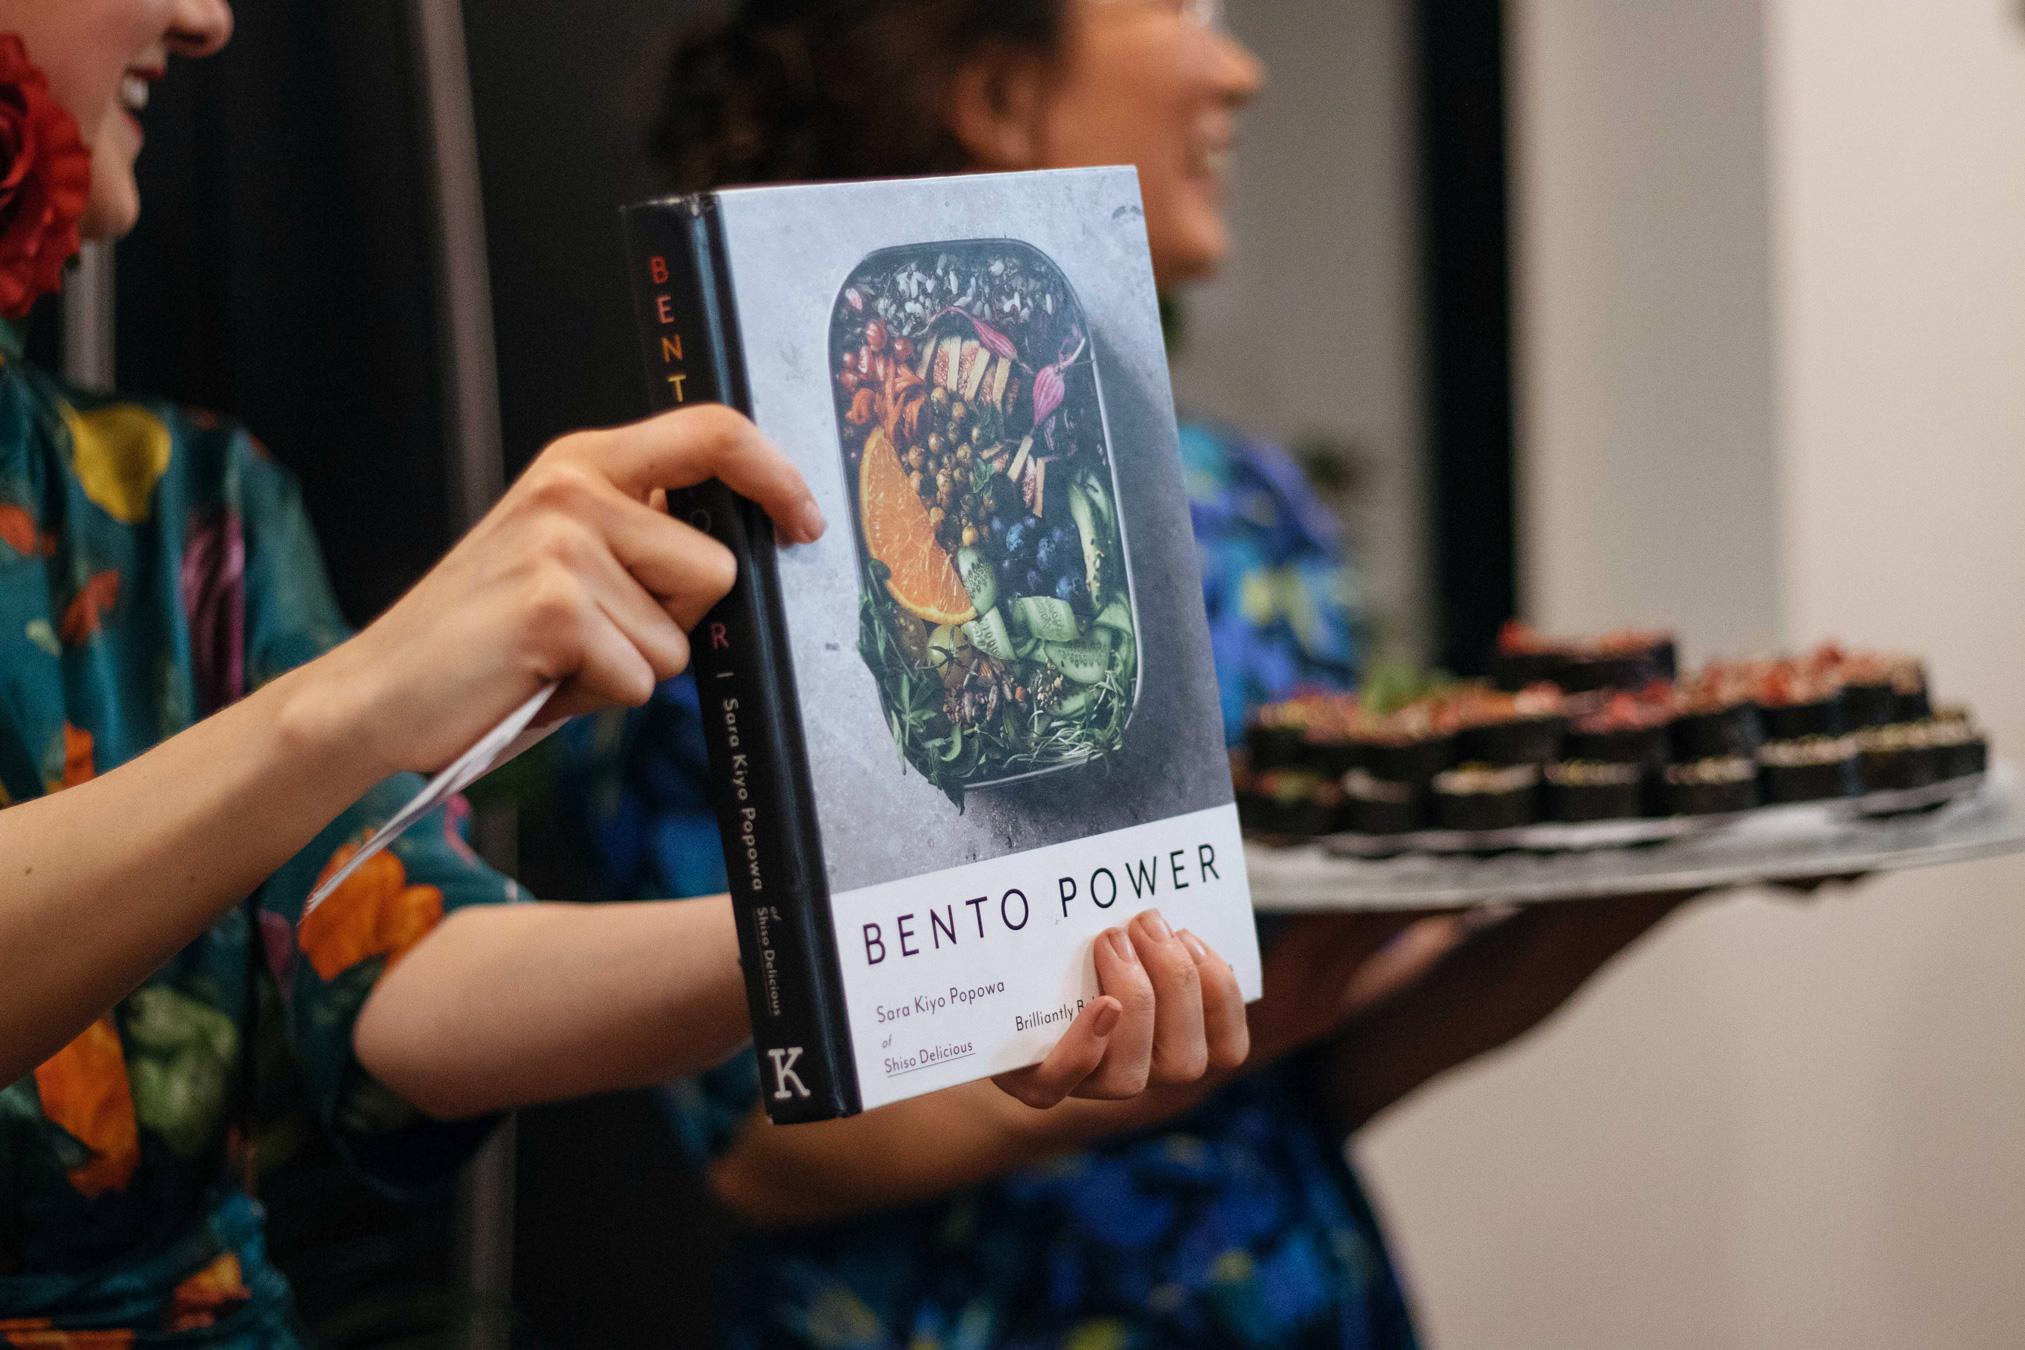 Sara Kiyo Popowa, author of Bento Power at Plant Hub and Gung Ho launch night February 2019, London. Photo by Ariana Ruth.